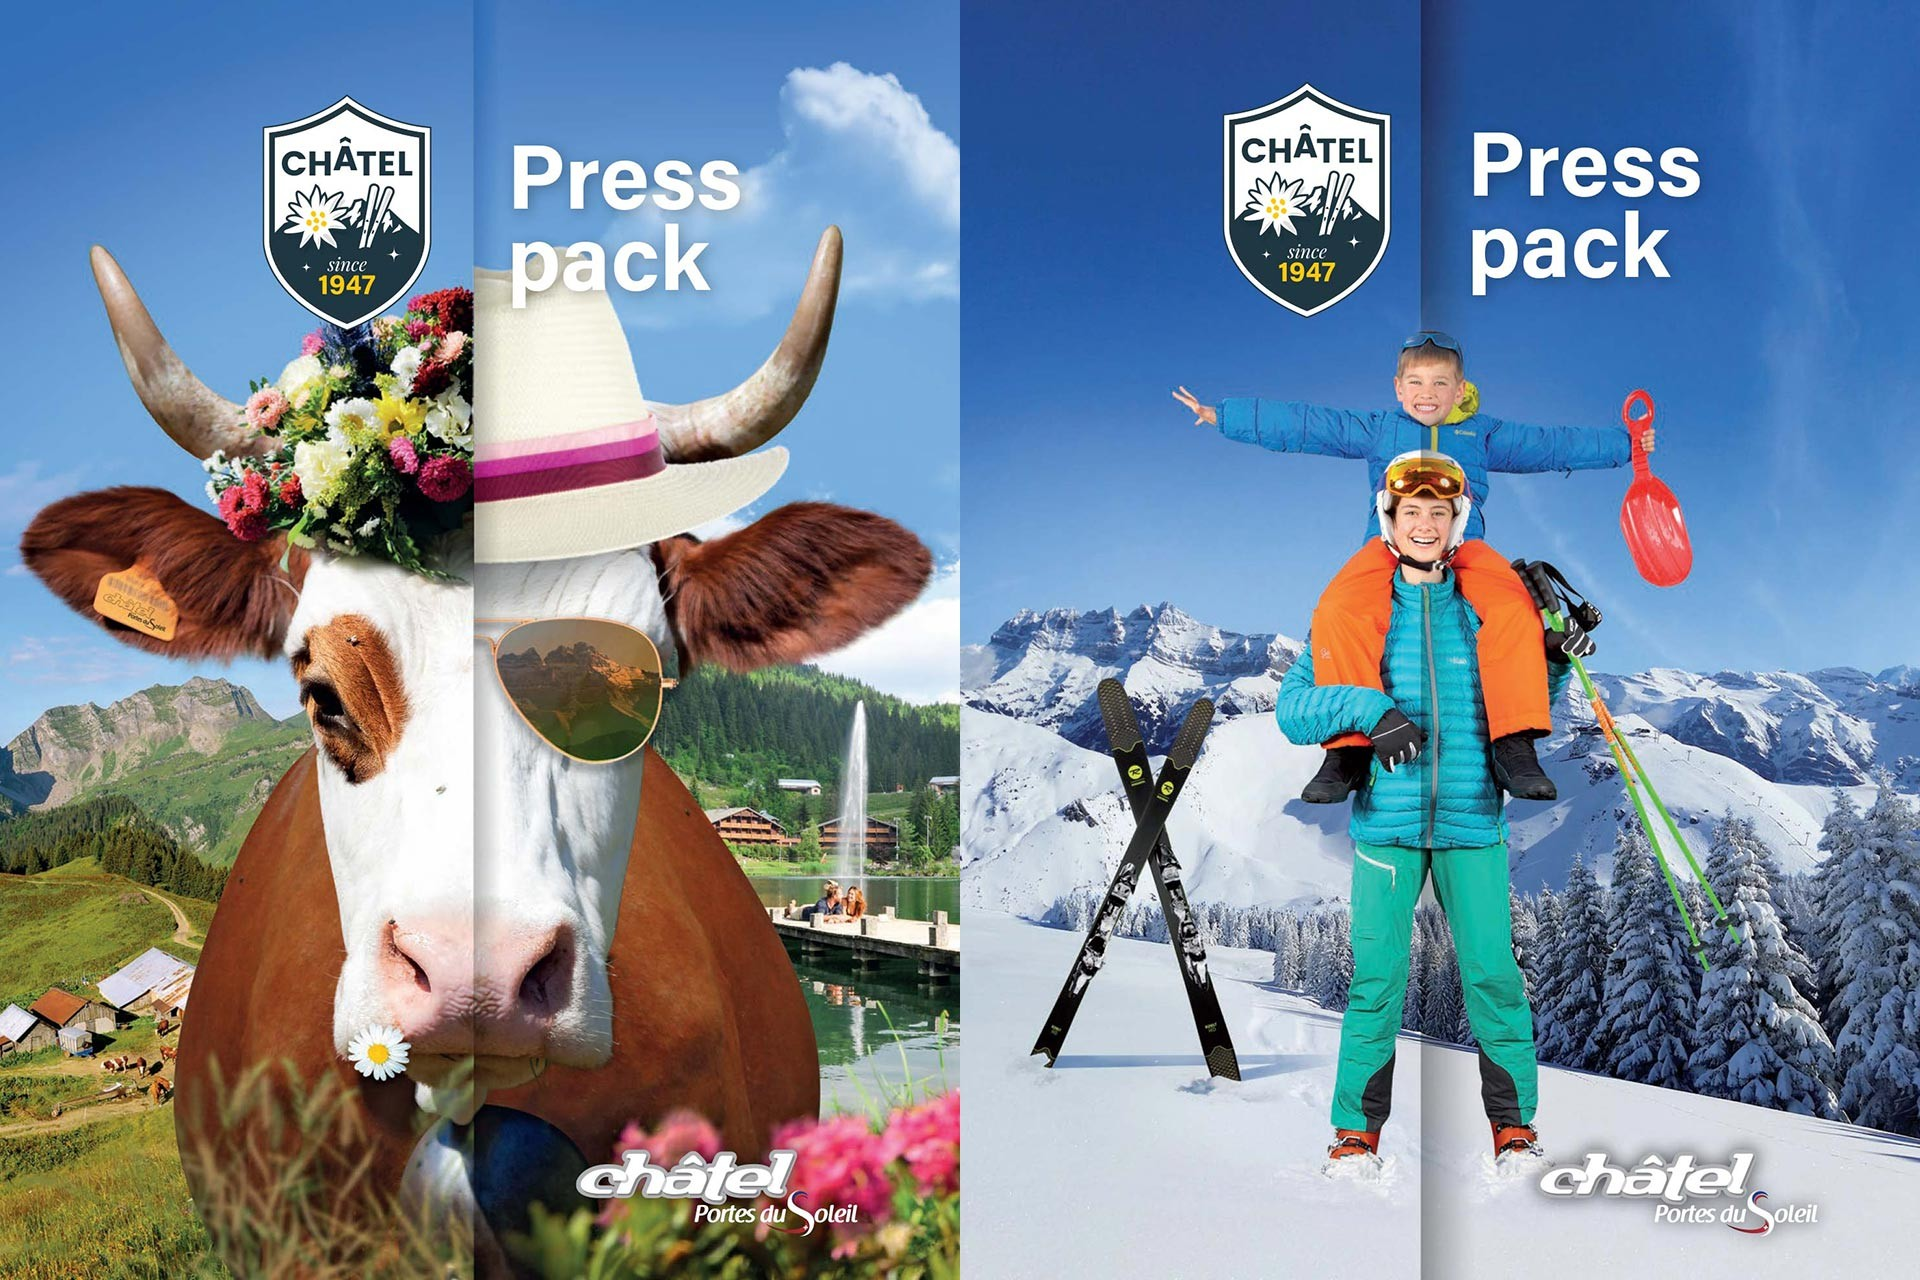 Press packs